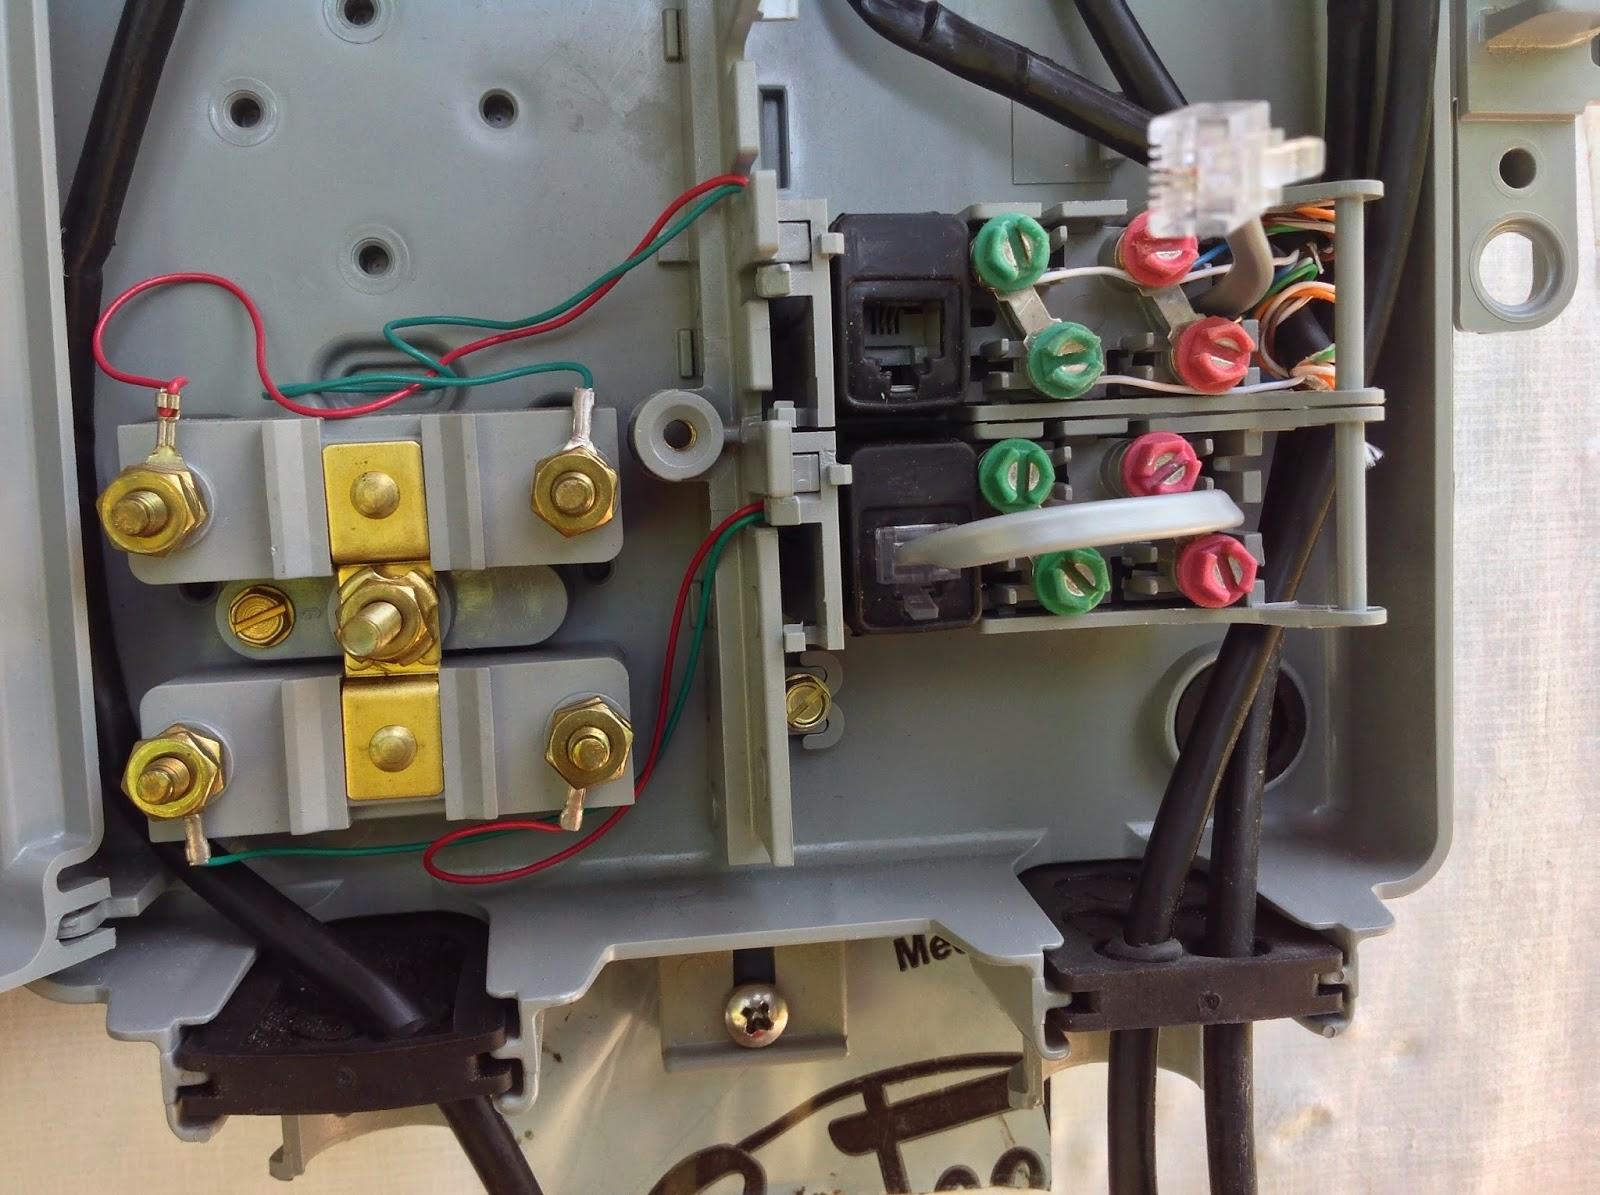 Att Phone Box Wiring Diagram | Manual E-Books - Telephone Wiring Diagram Outside Box